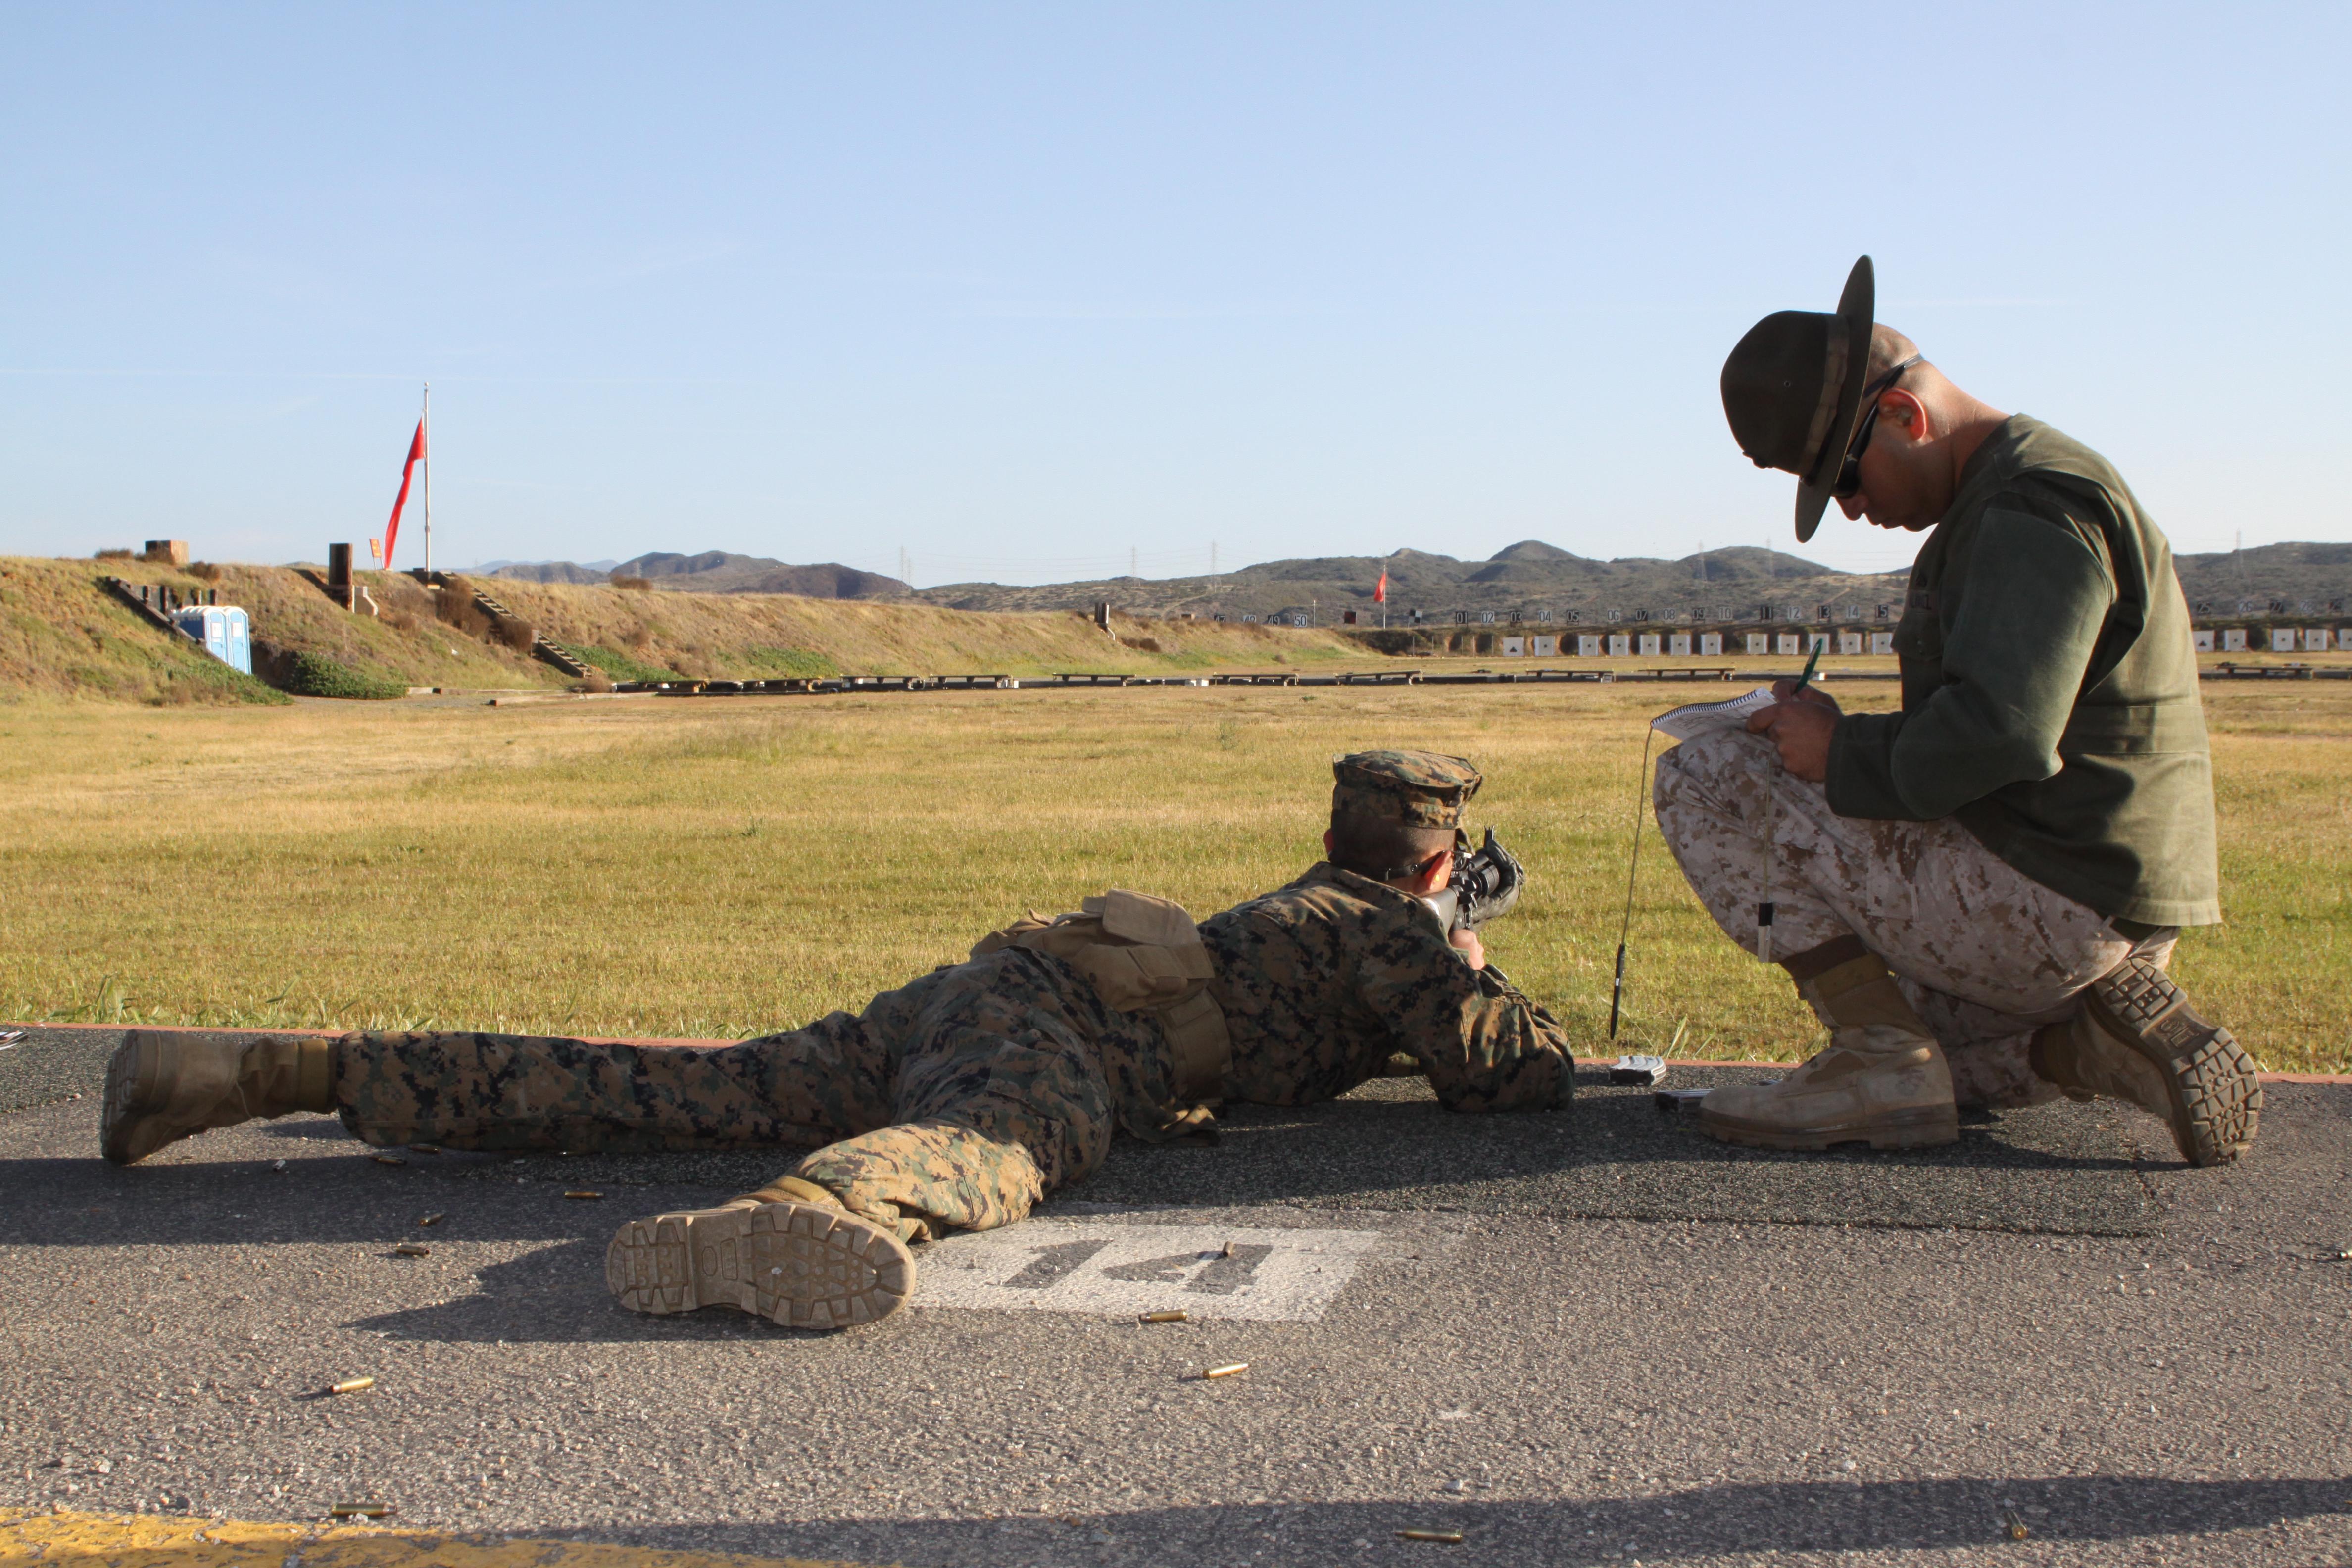 Co L recruits apply Marine Corps marksmanship skills Marine Corps